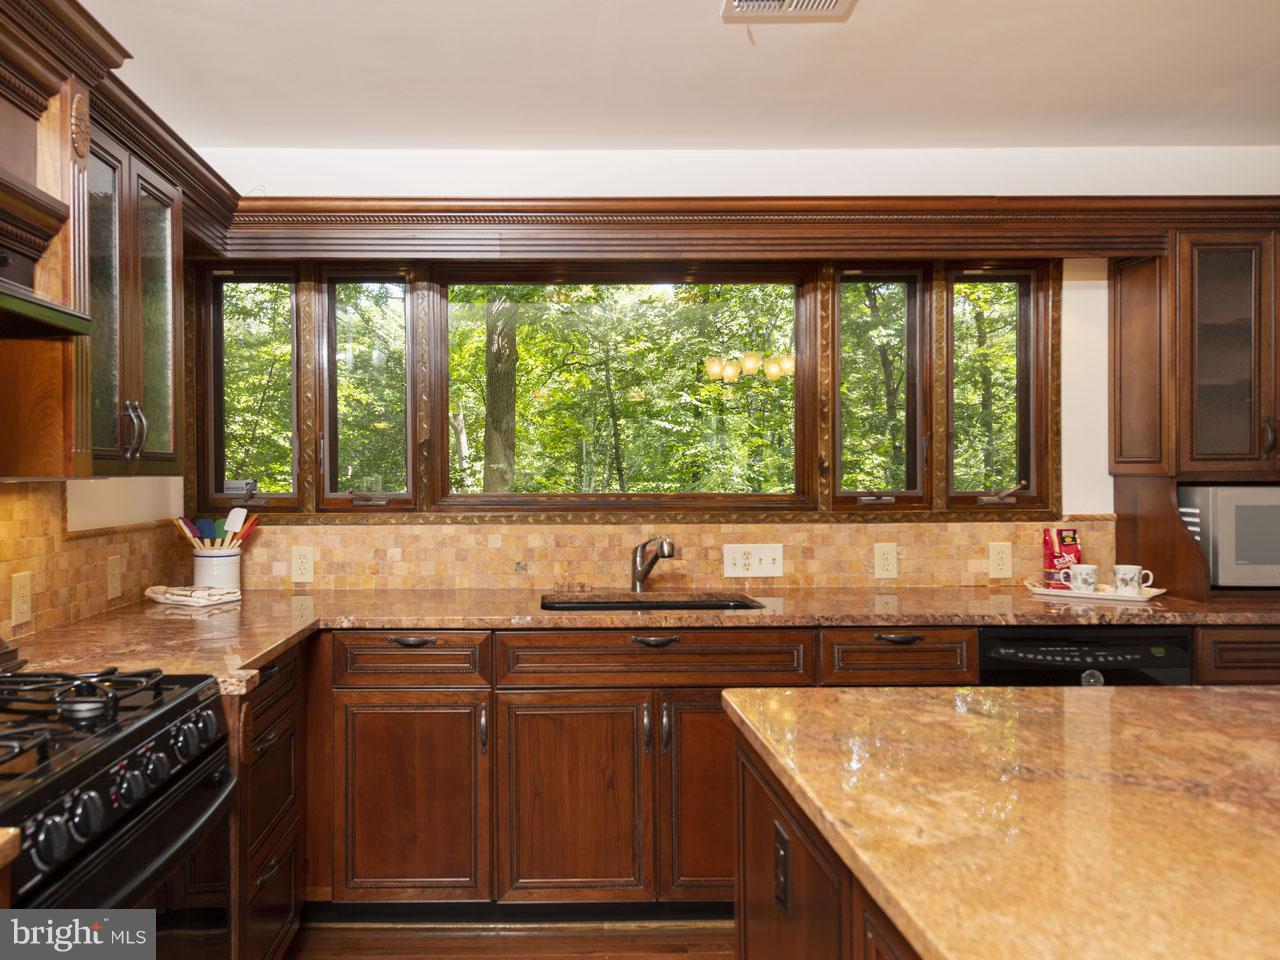 1002303700-300502417921-2021-07-22-03-27-23  |   | Alexandria Delaware Real Estate For Sale | MLS# 1002303700  - Best of Northern Virginia